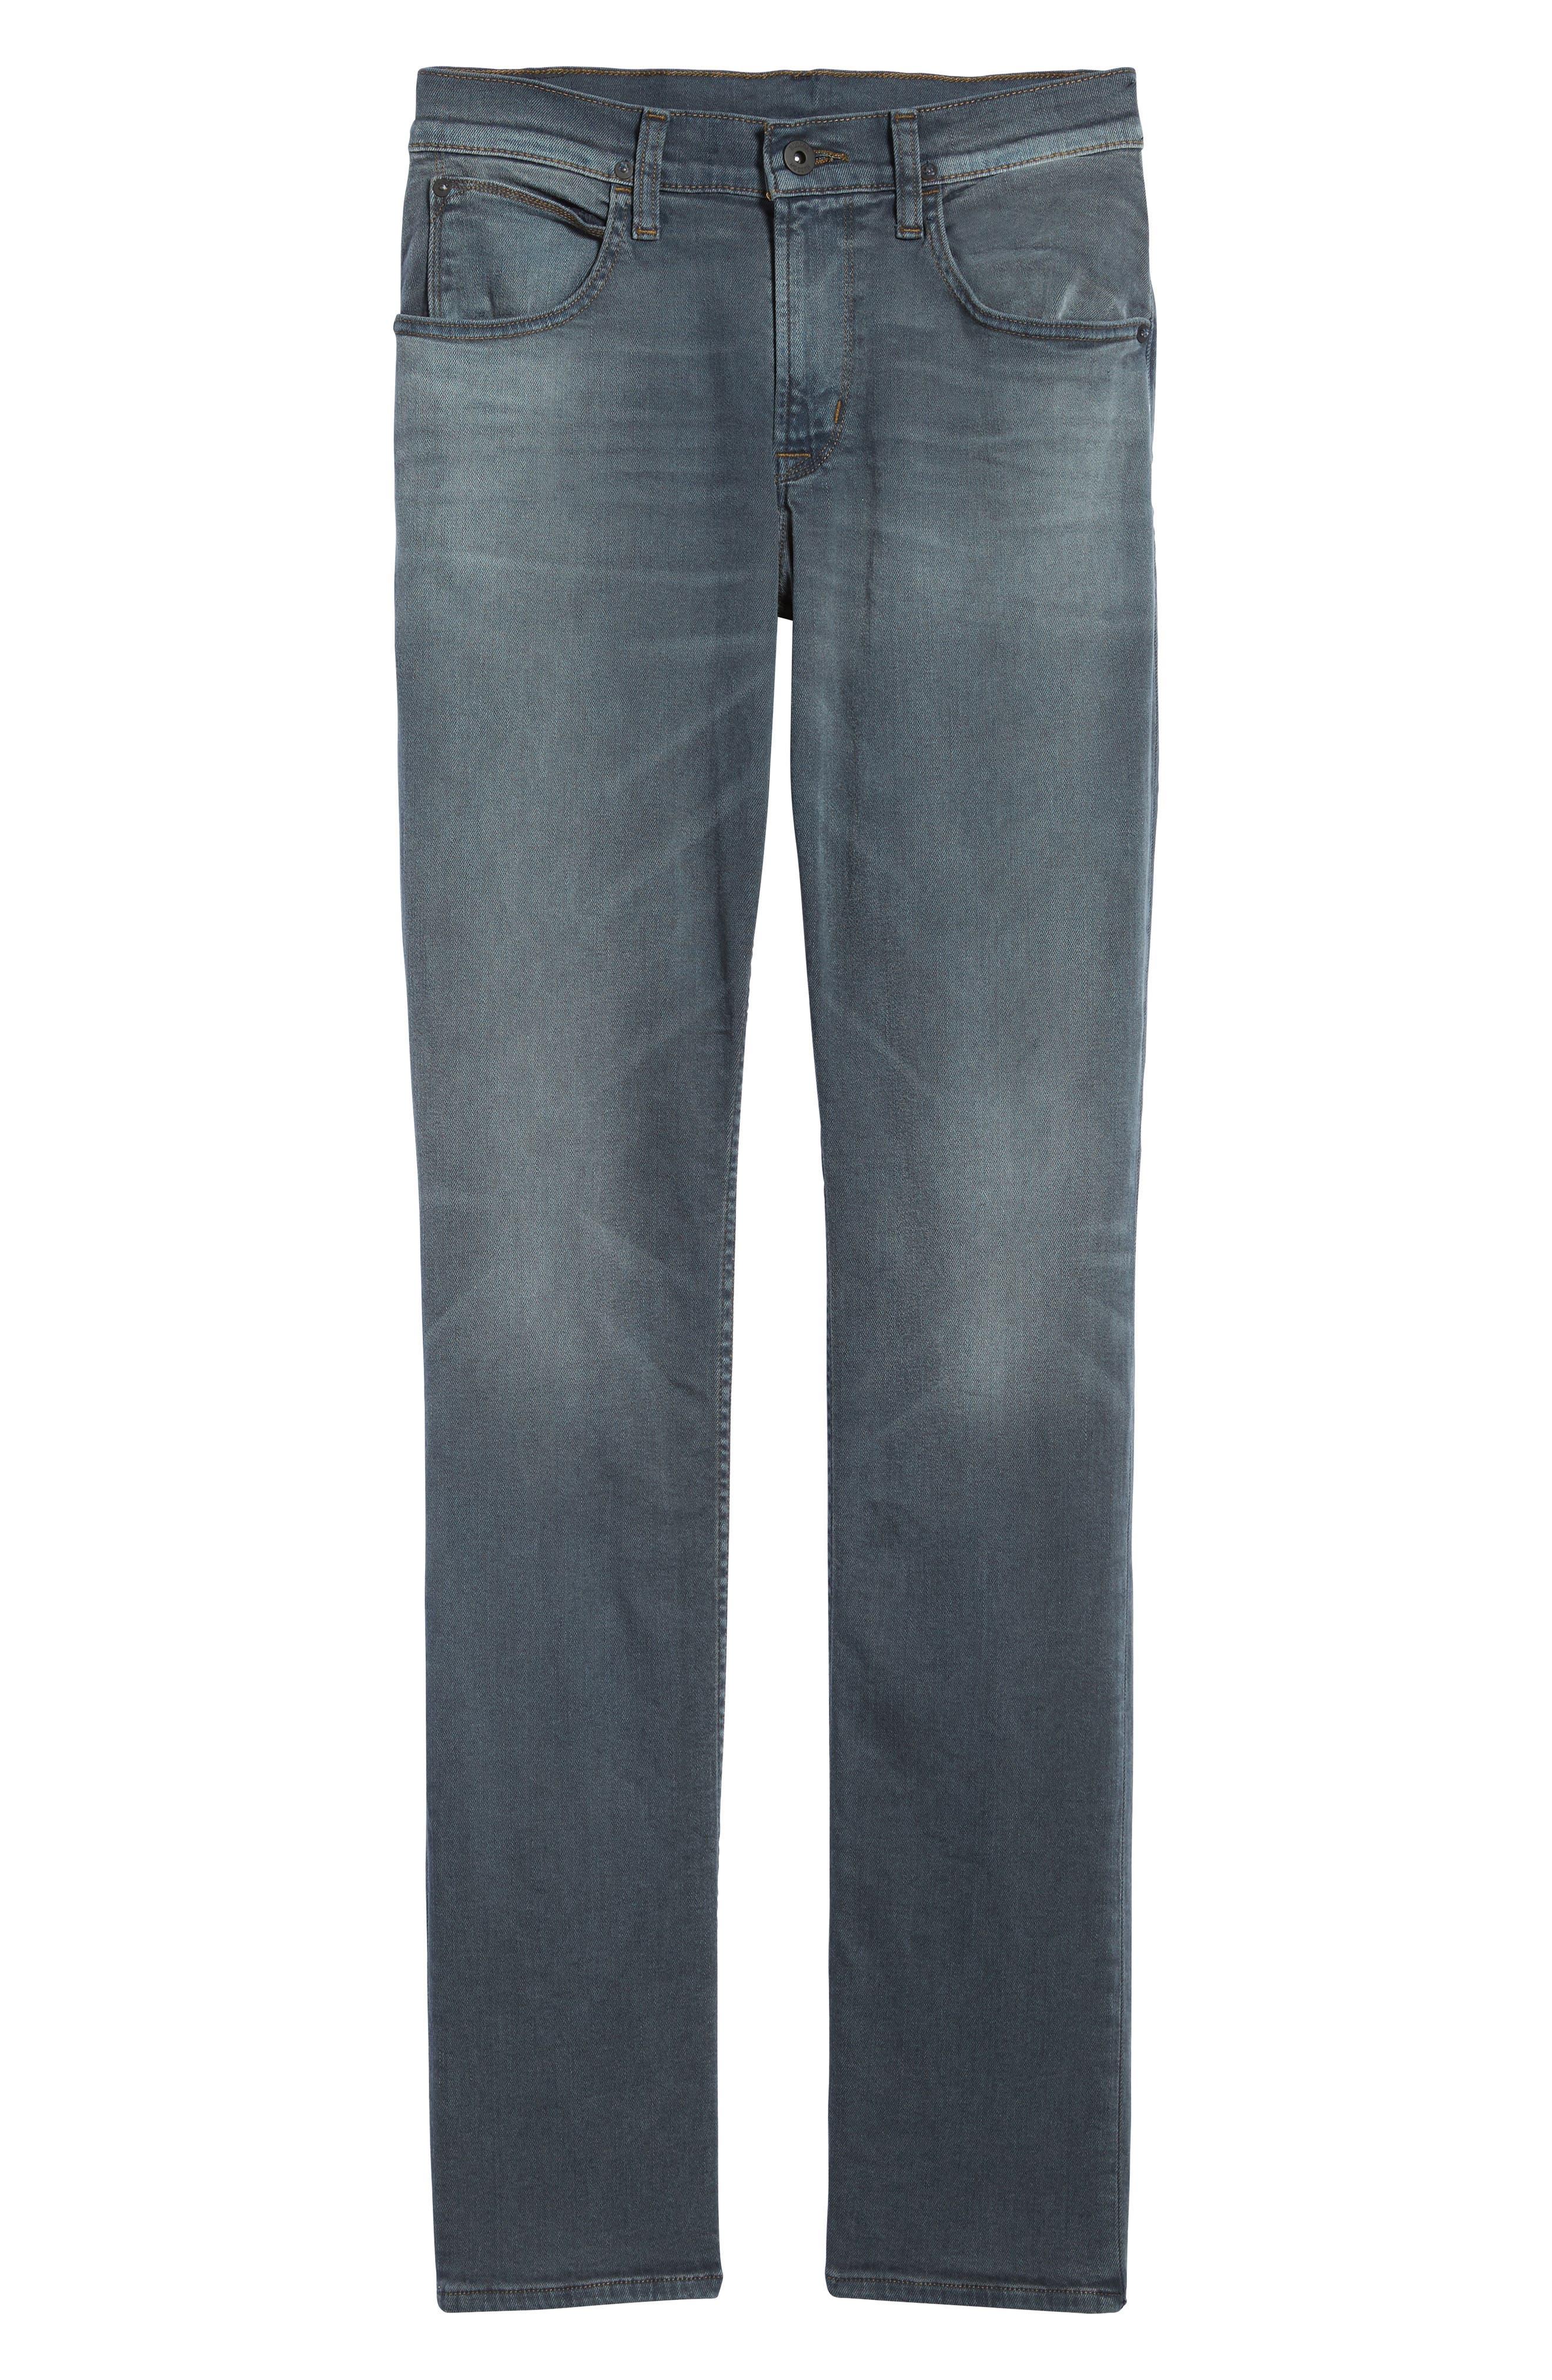 Byron Slim Straight Leg Jeans,                             Alternate thumbnail 6, color,                             020